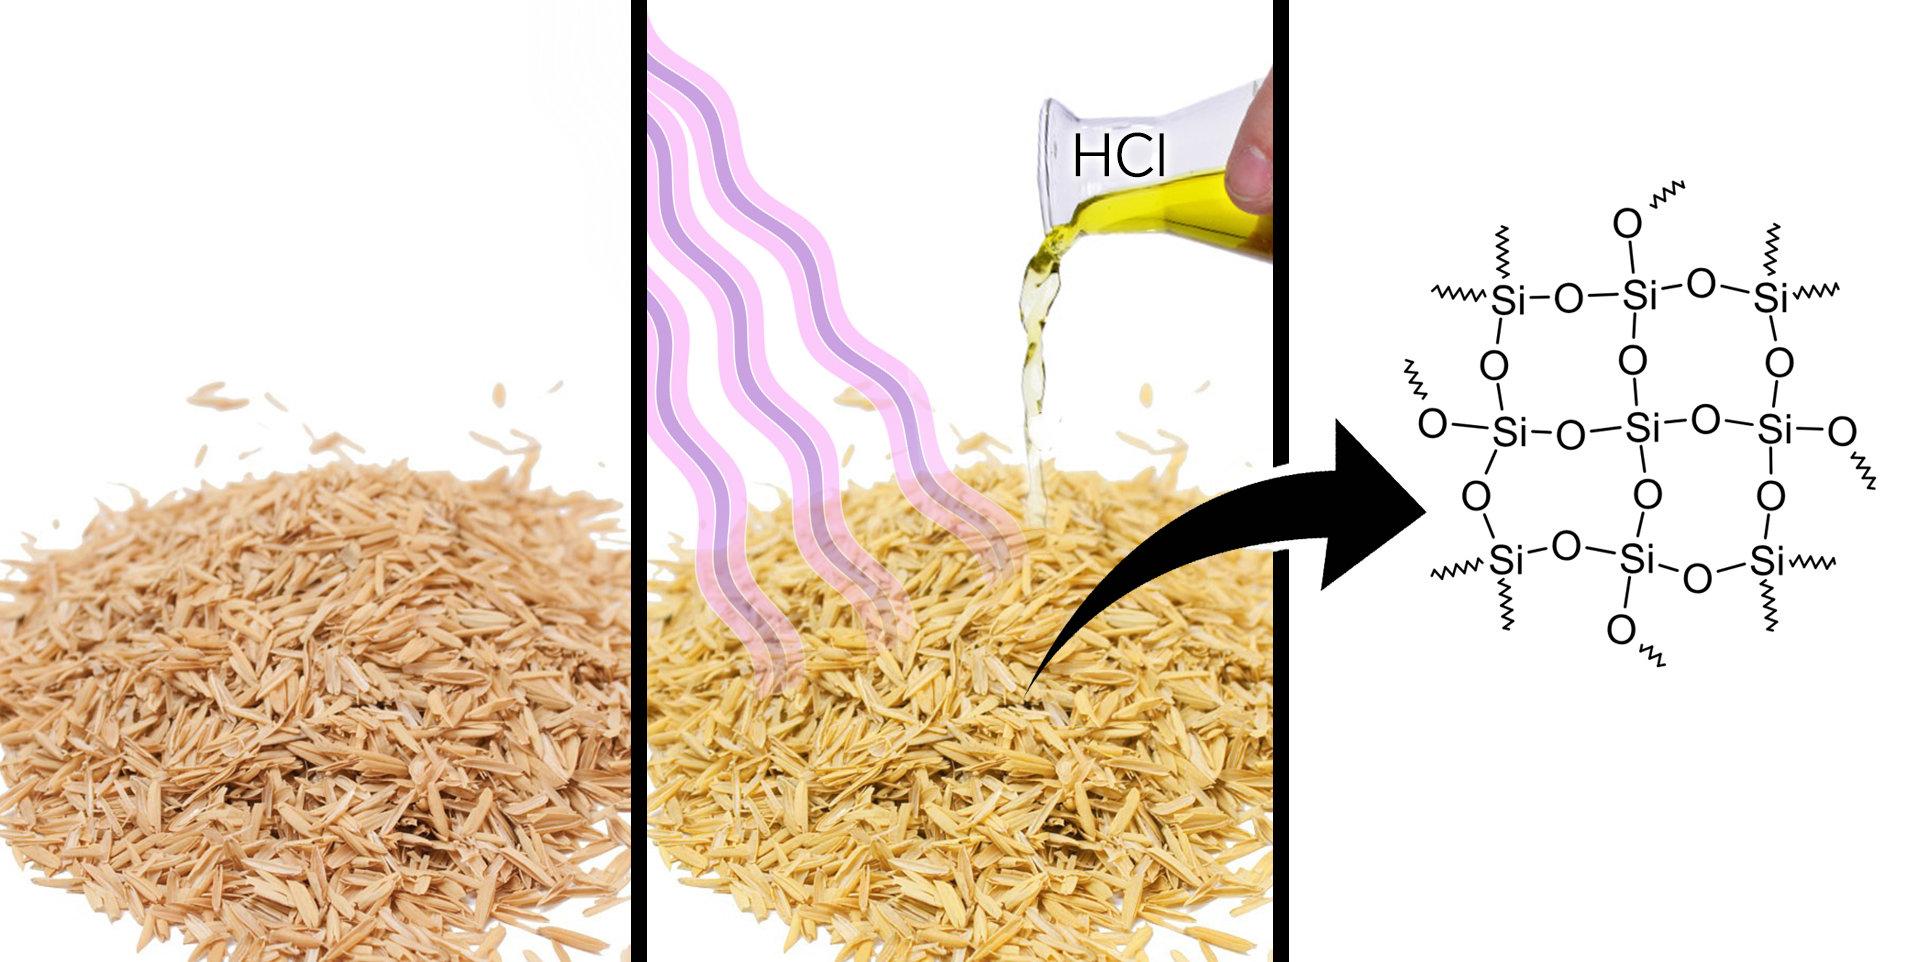 Chemist obtains a nanocatalyst base from rice husk